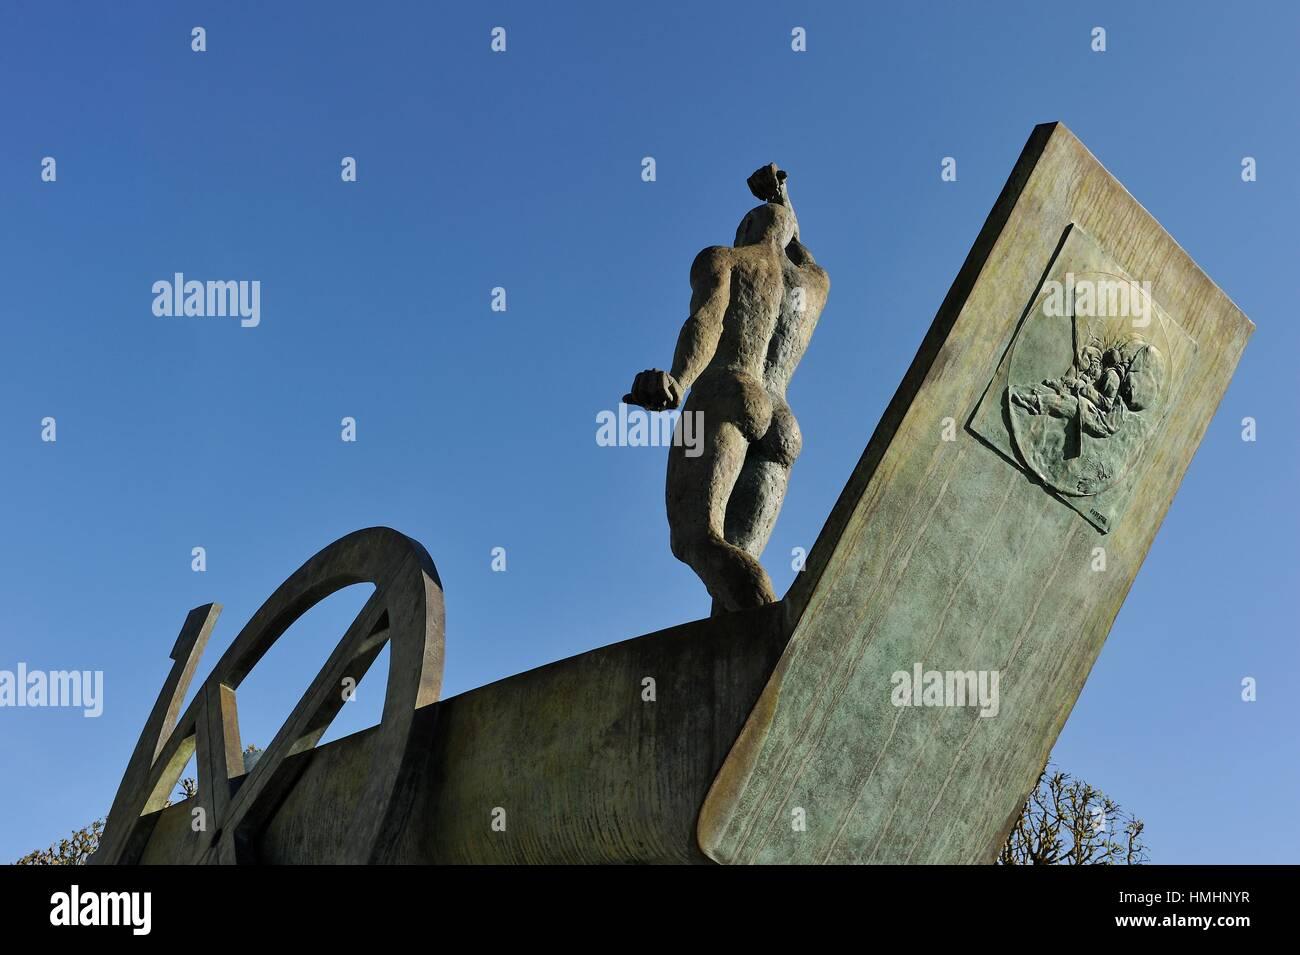 ´´Barque Solaire´´ work by the Franco-Czech sculptor Karel Zlin, Castle ´s park of Rambouillet, - Stock Image